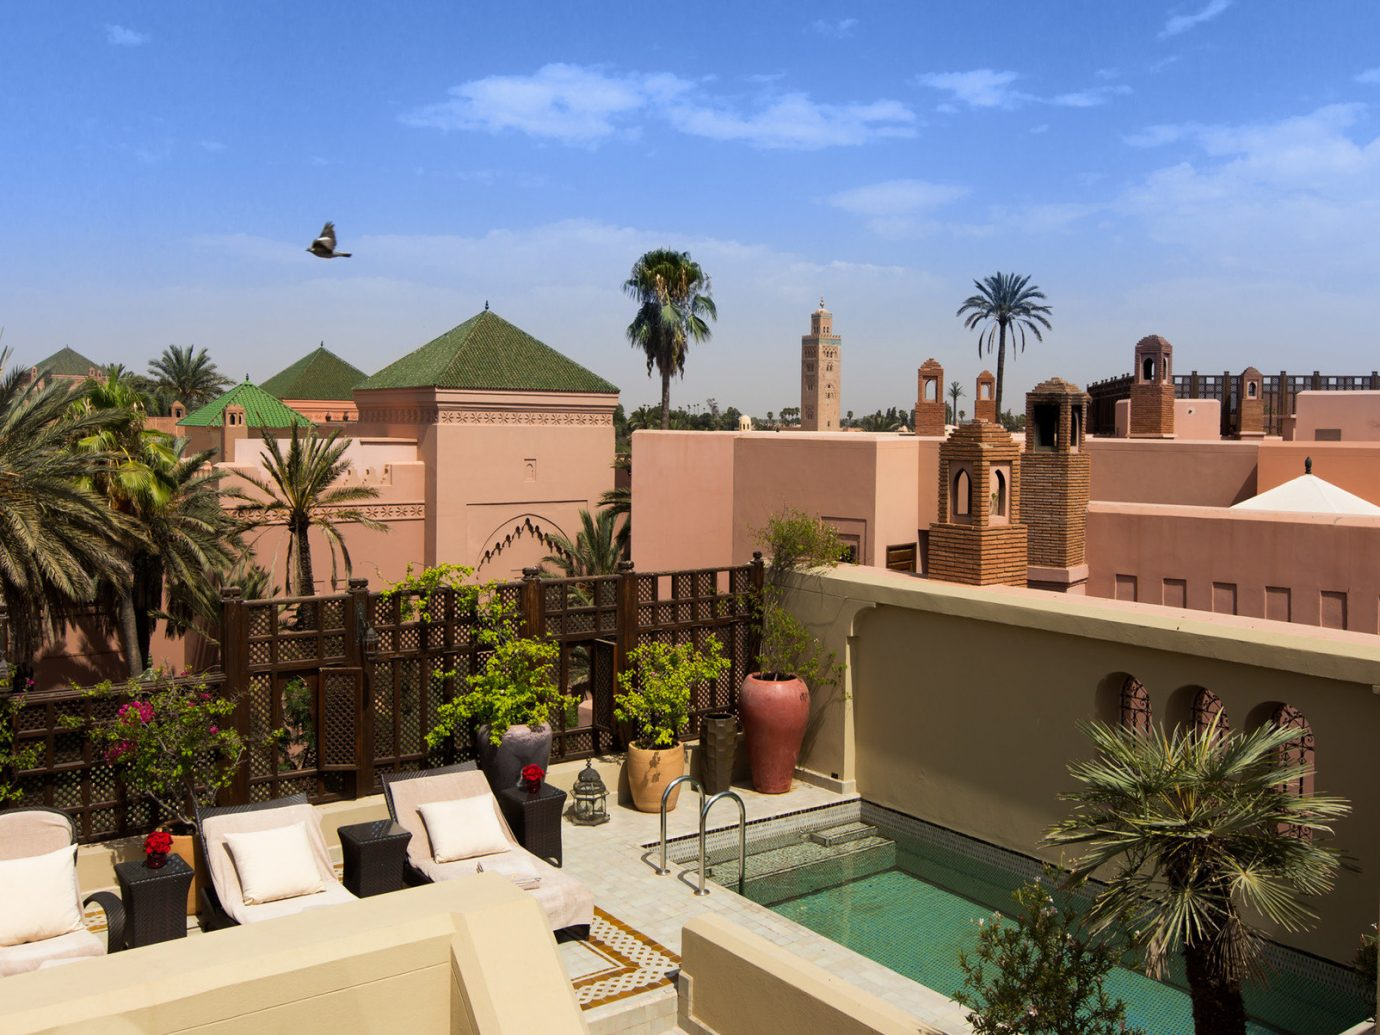 Hotels property estate Resort Villa home vacation hacienda condominium real estate mansion plant palm